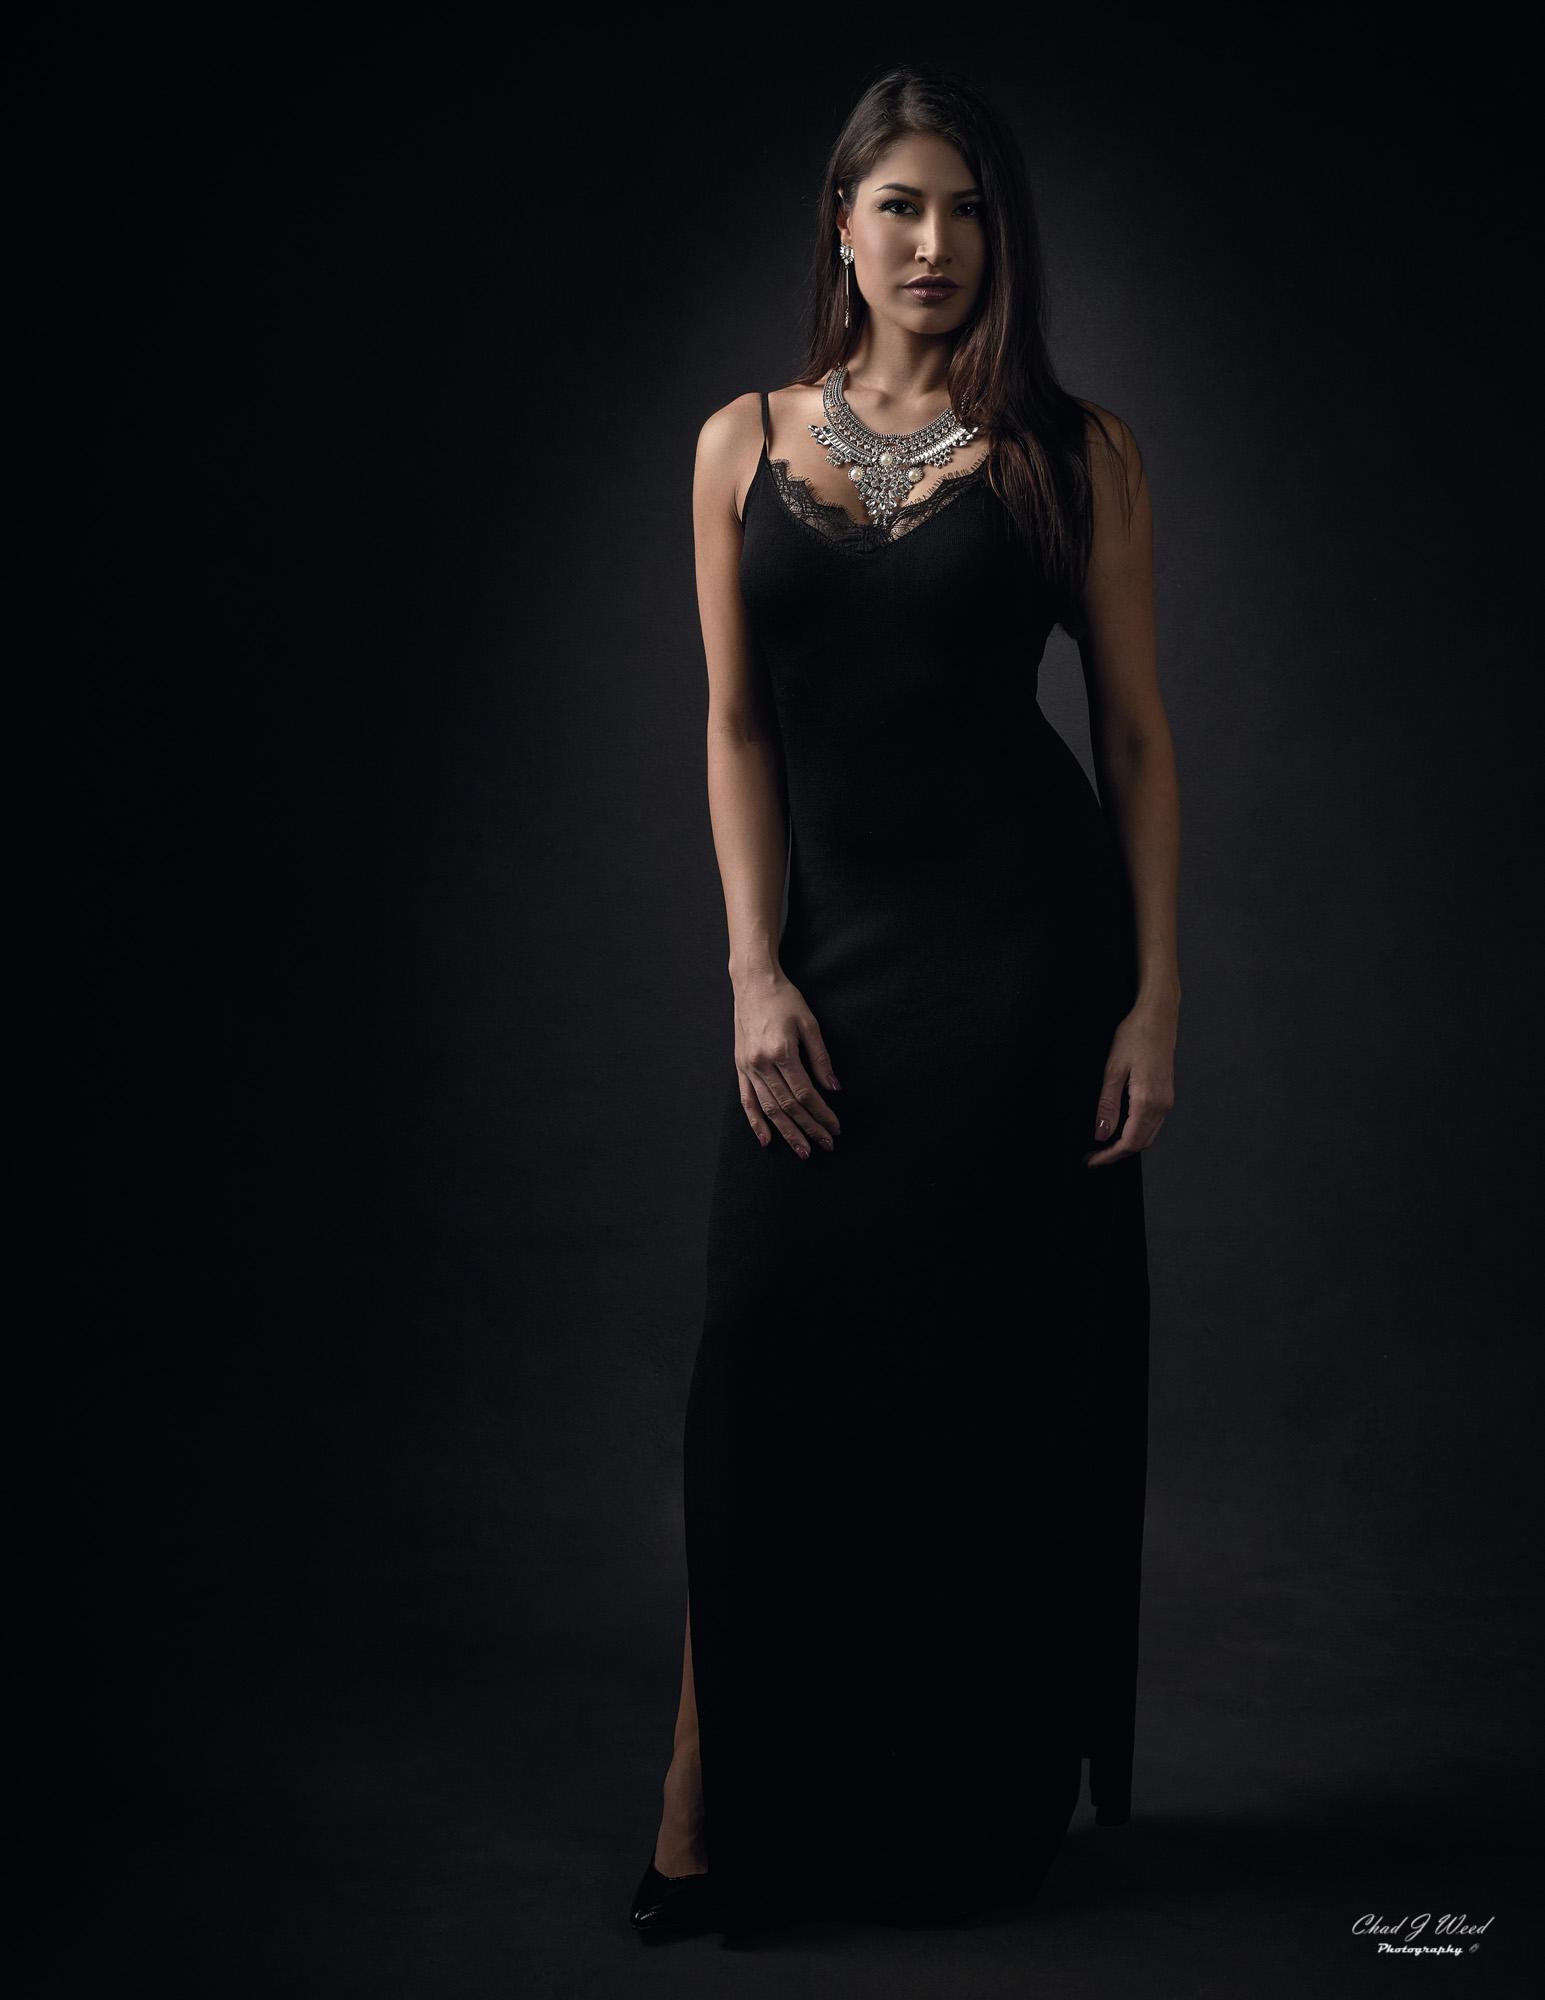 Arizona Fashion Photographer Chad Weed with Fitness Model Ashly - Black Dress 2